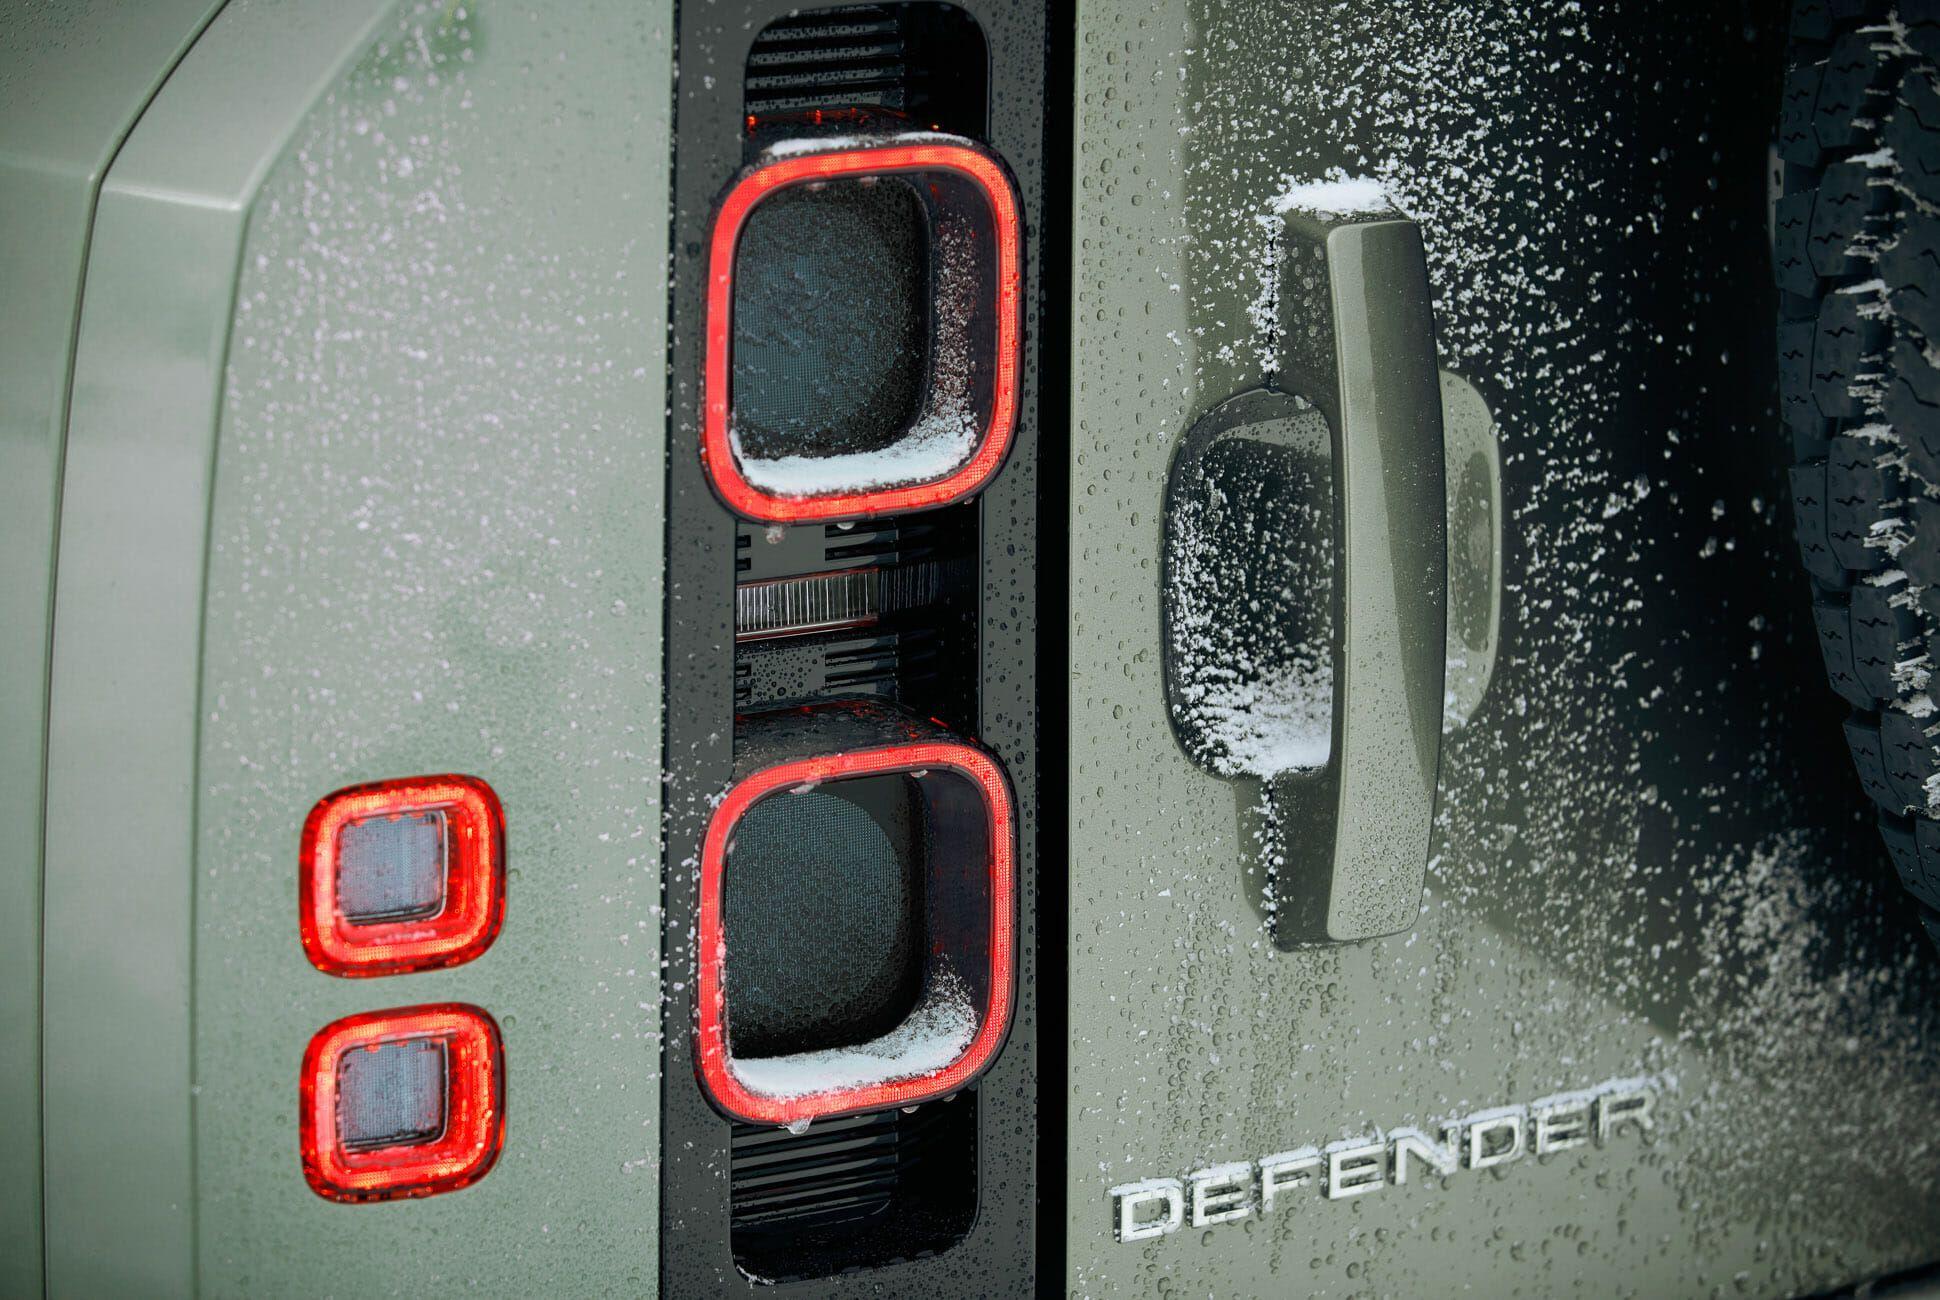 Land Rover Defender Gear Patrol-Exterior Action-Slide-03